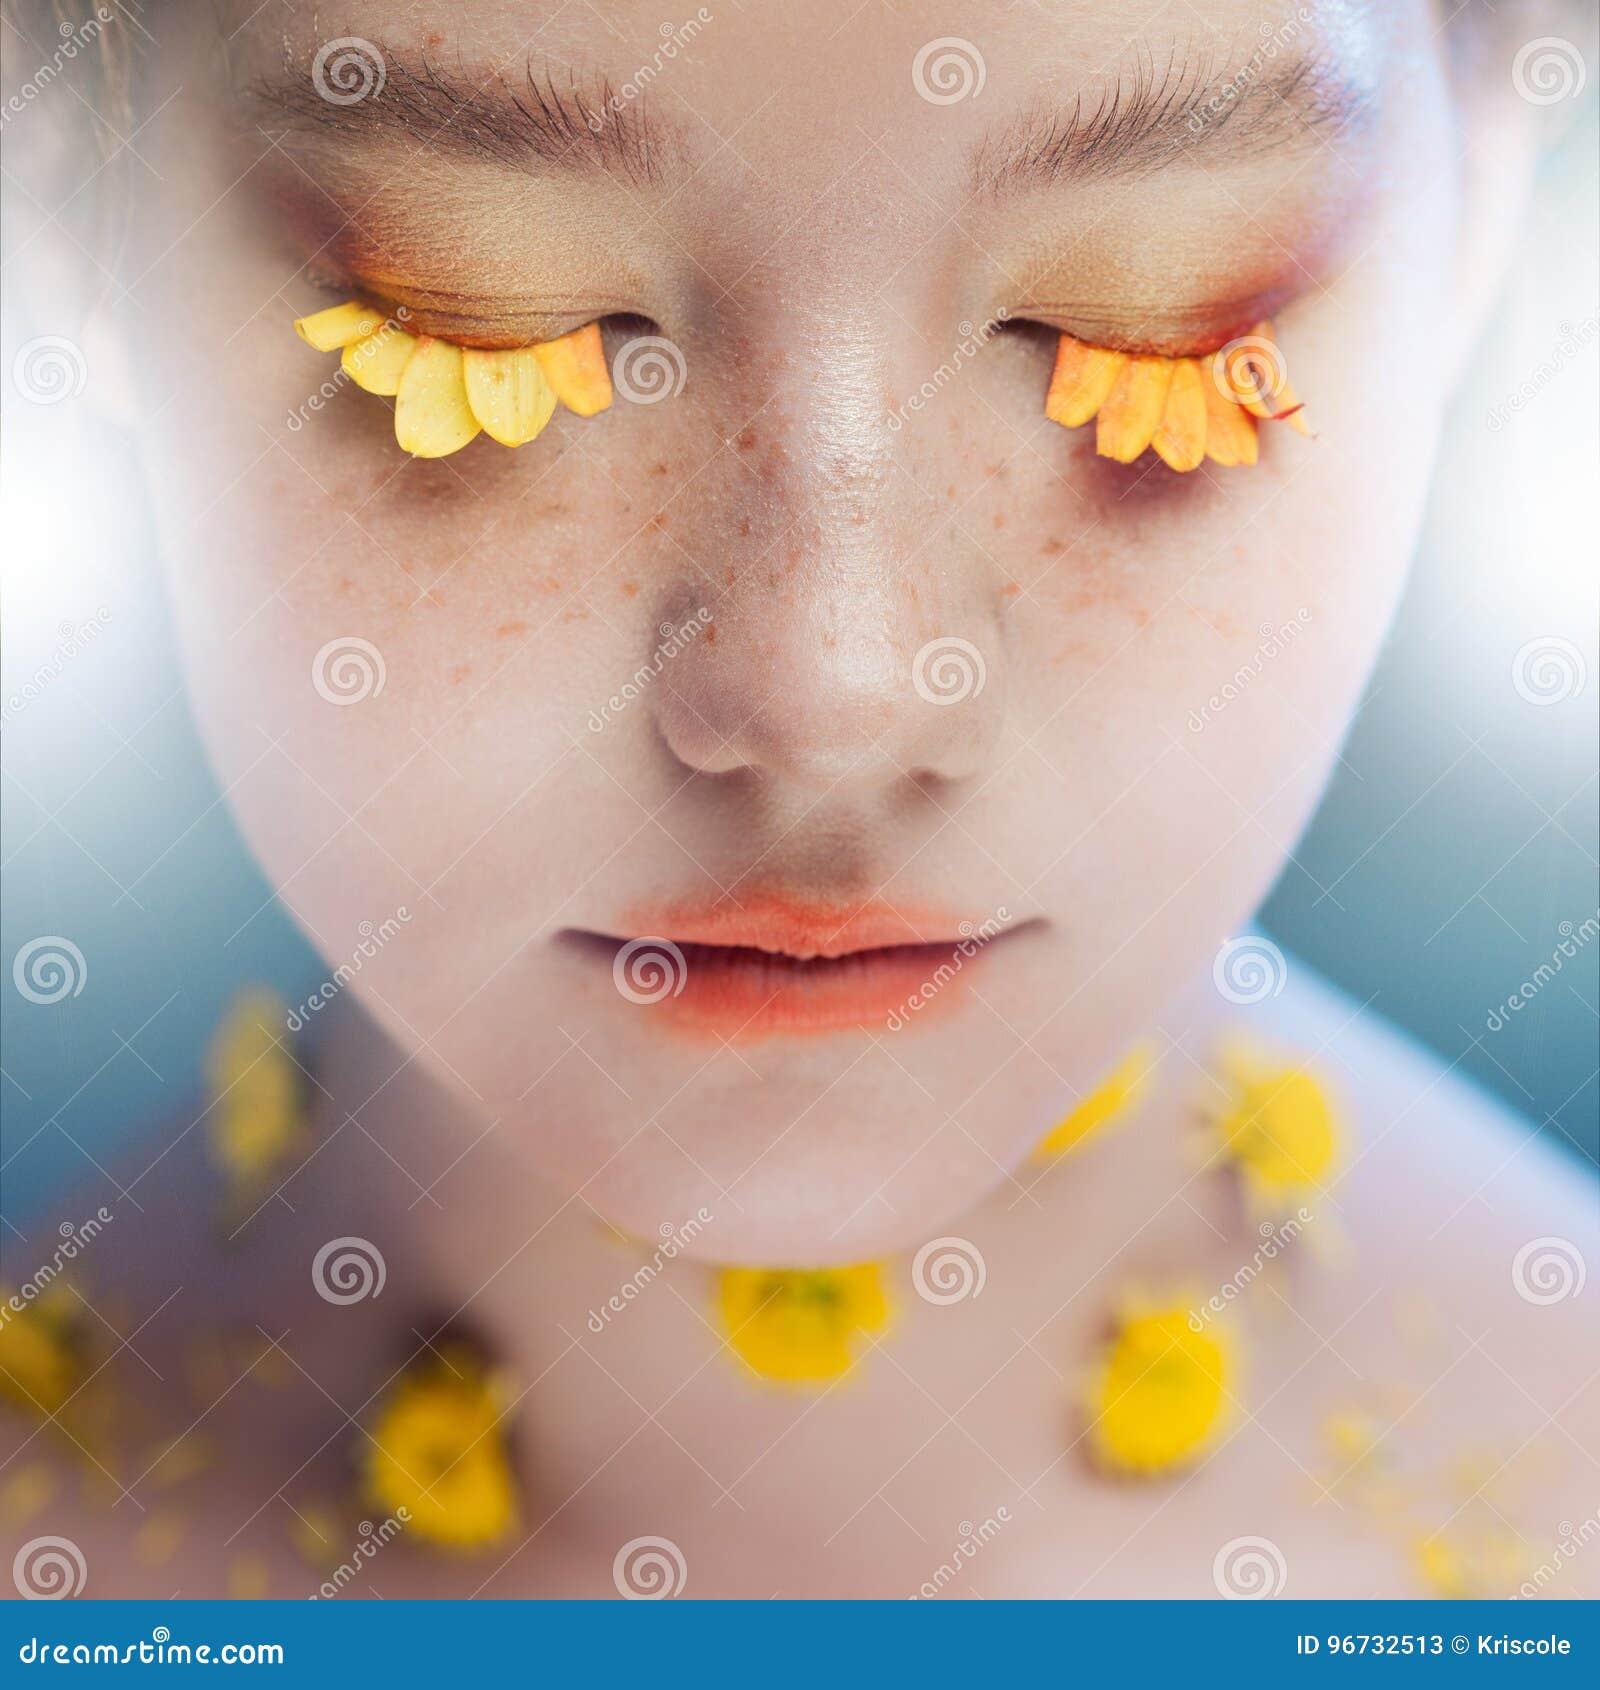 Eyelashes όπως τα πέταλα των λουλουδιών Όμορφο νέο κορίτσι στην εικόνα της χλωρίδας, πορτρέτο κινηματογραφήσεων σε πρώτο πλάνο